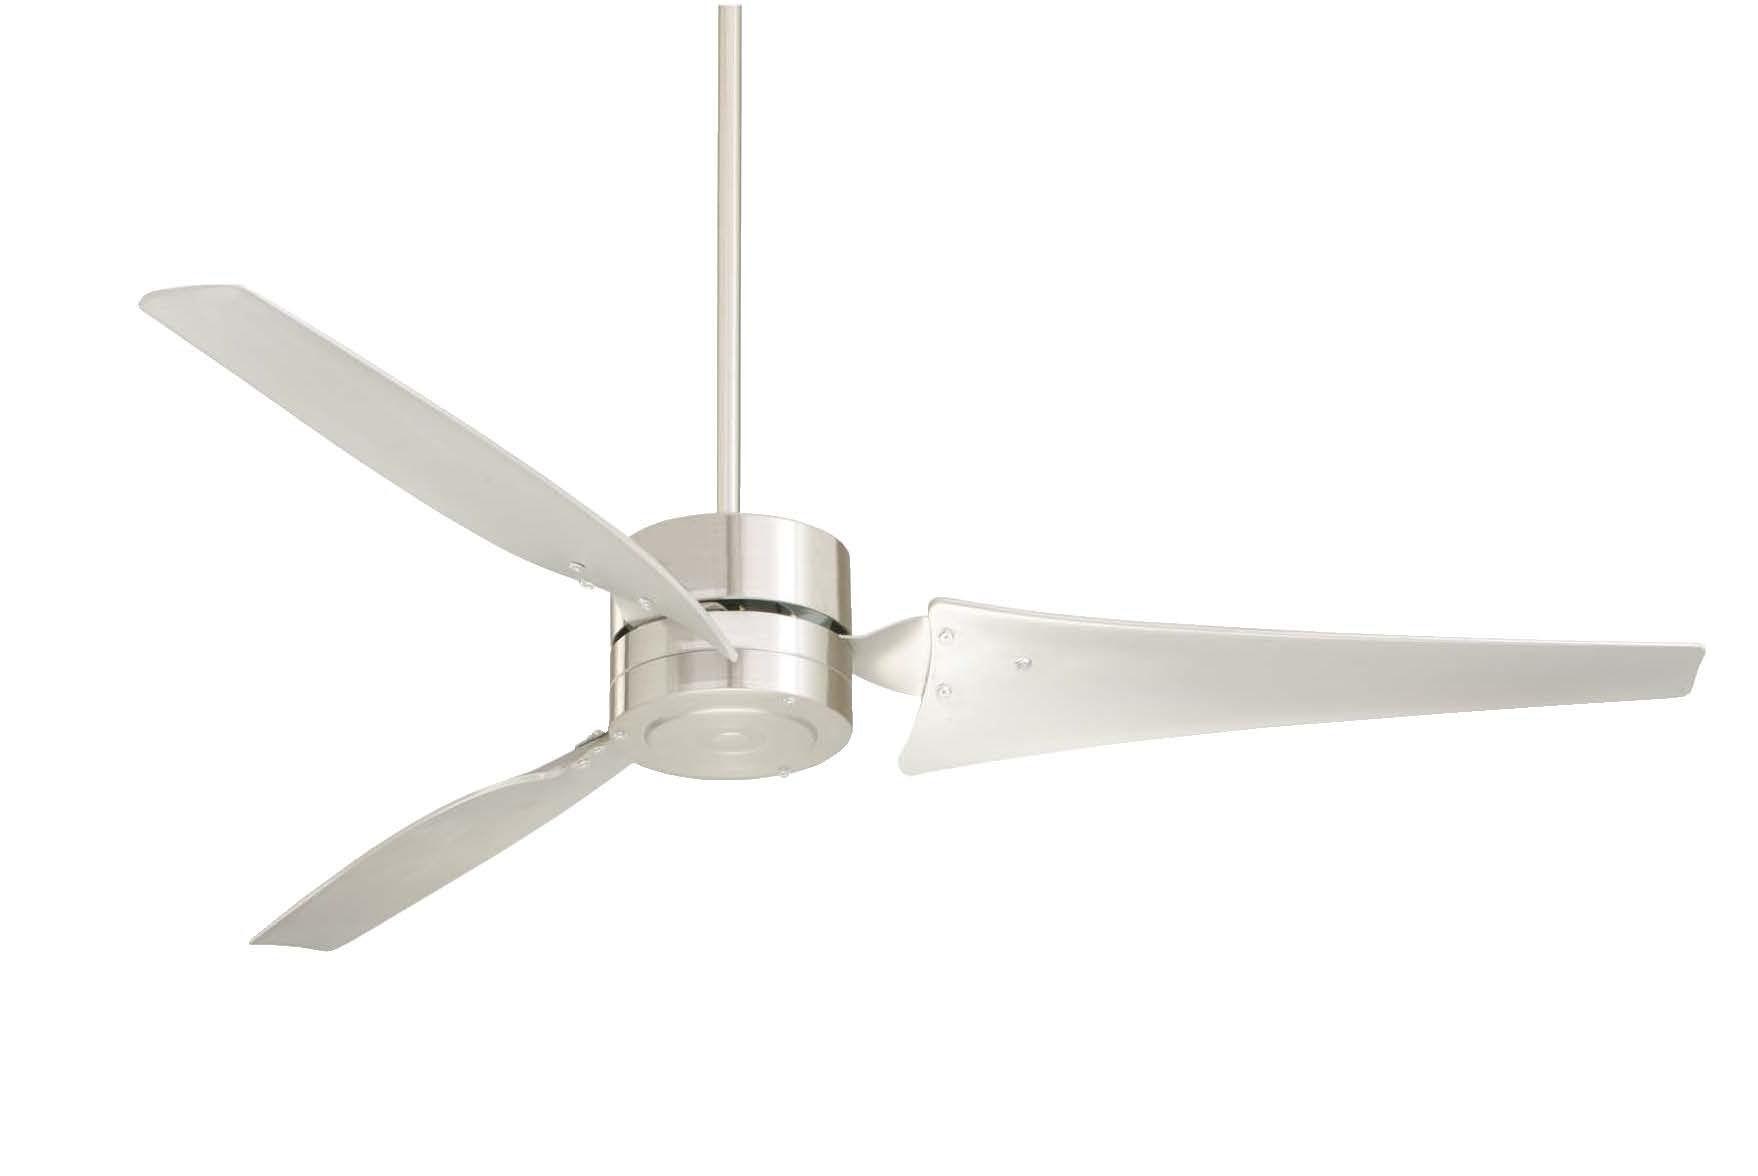 "Emerson HF1160WW Appliance White Industrial Heat Fans 60"" 3 Blade"